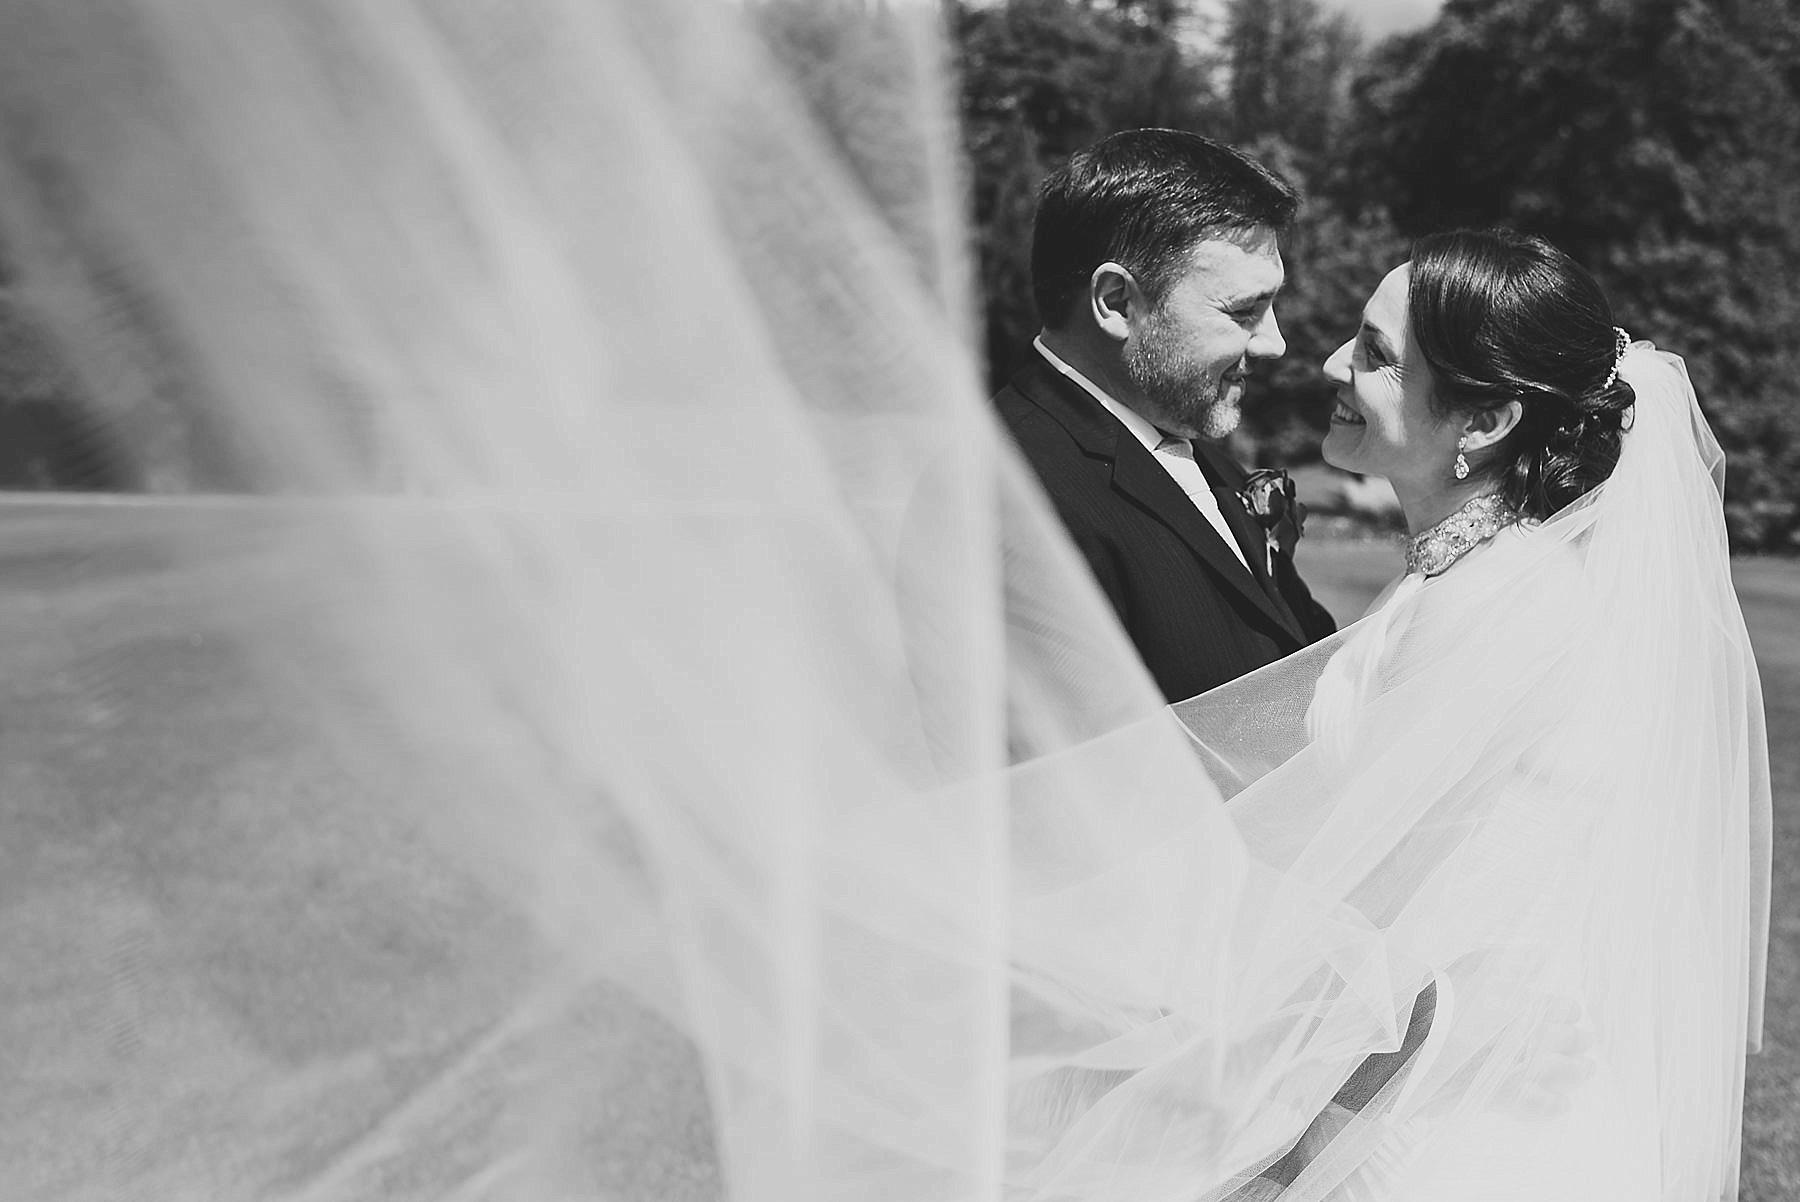 veil wedding portrait